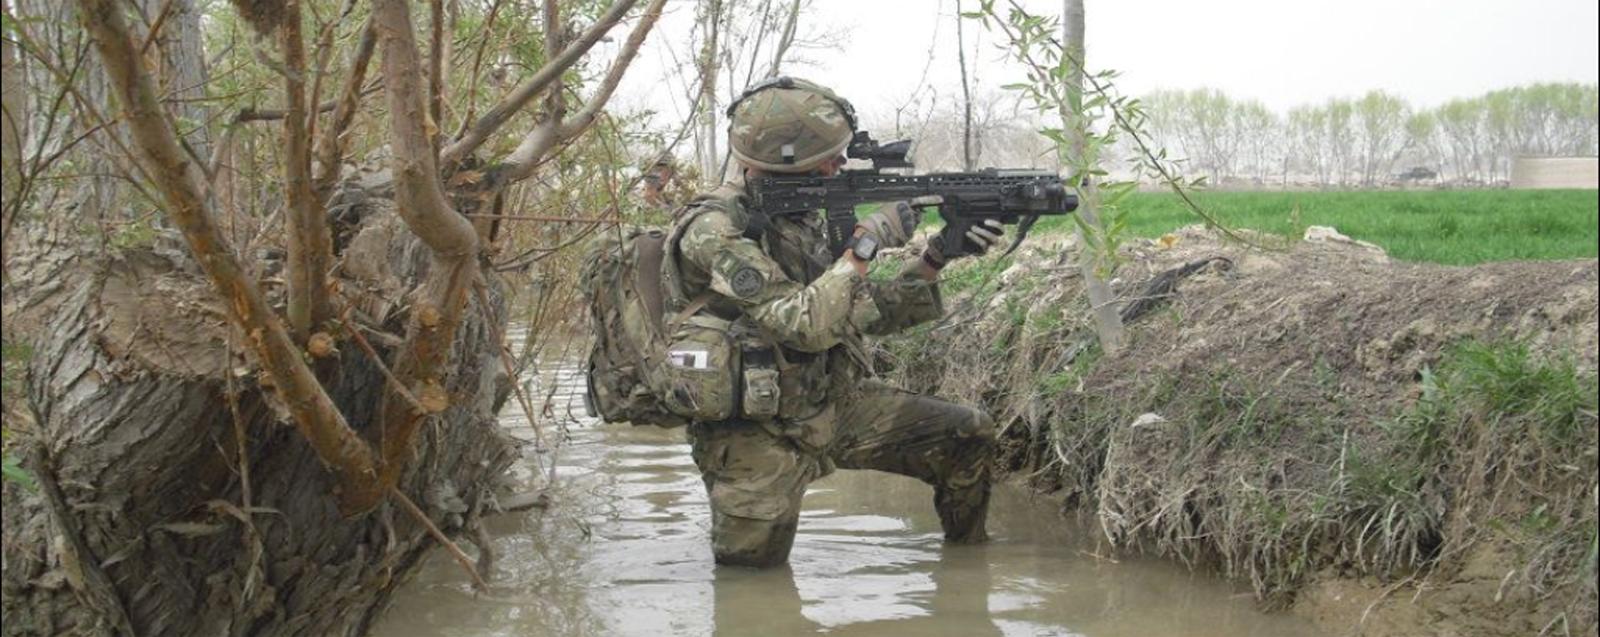 Army Surplus, Military Equipment   Air Rifles Pistols   Ranger Surrey